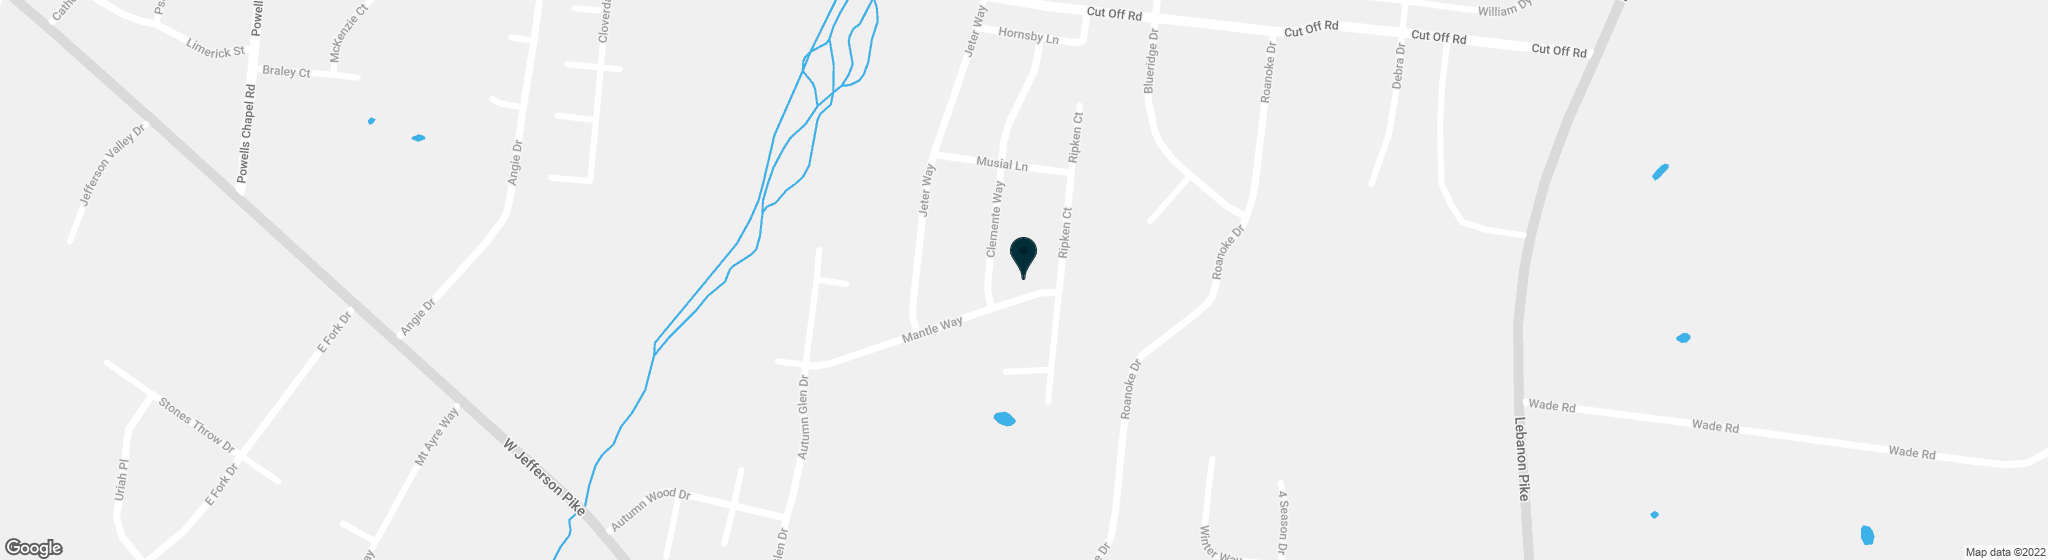 1108 Mantle Way Murfreesboro TN 37129